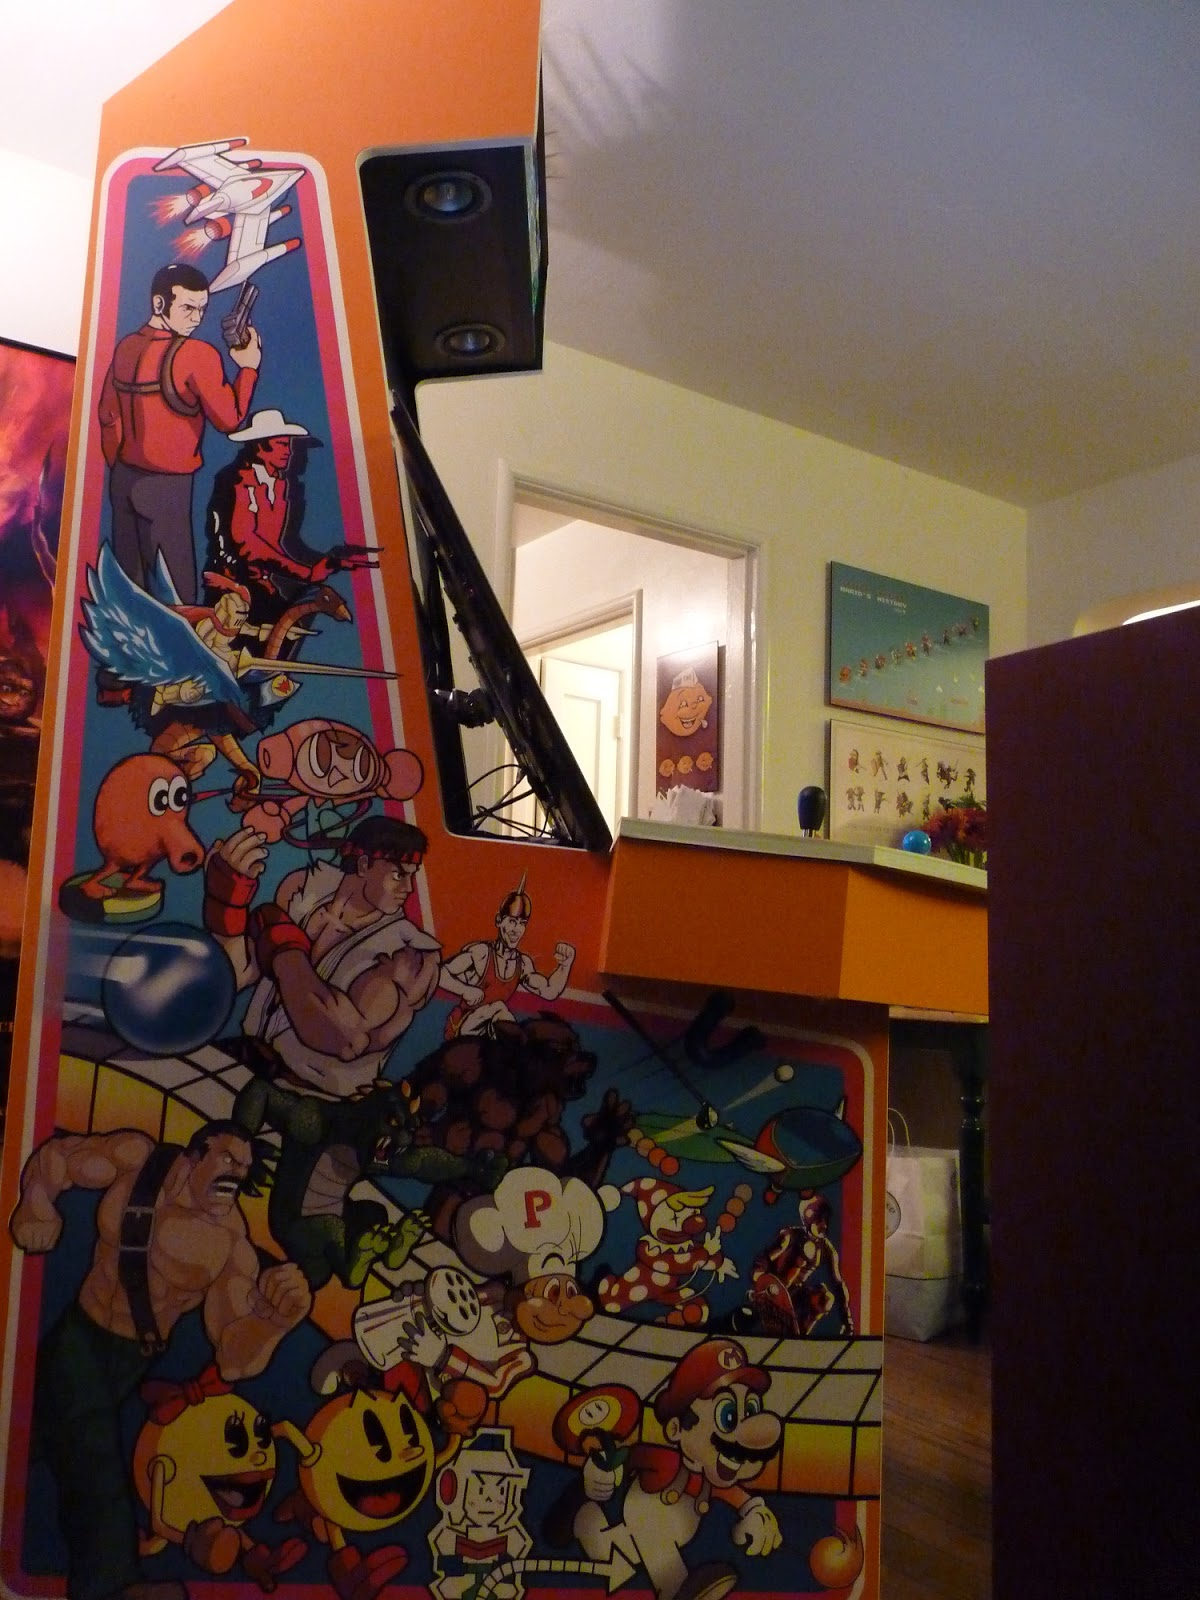 The Artcade Arcade Art Antagonist Vs Protagonist